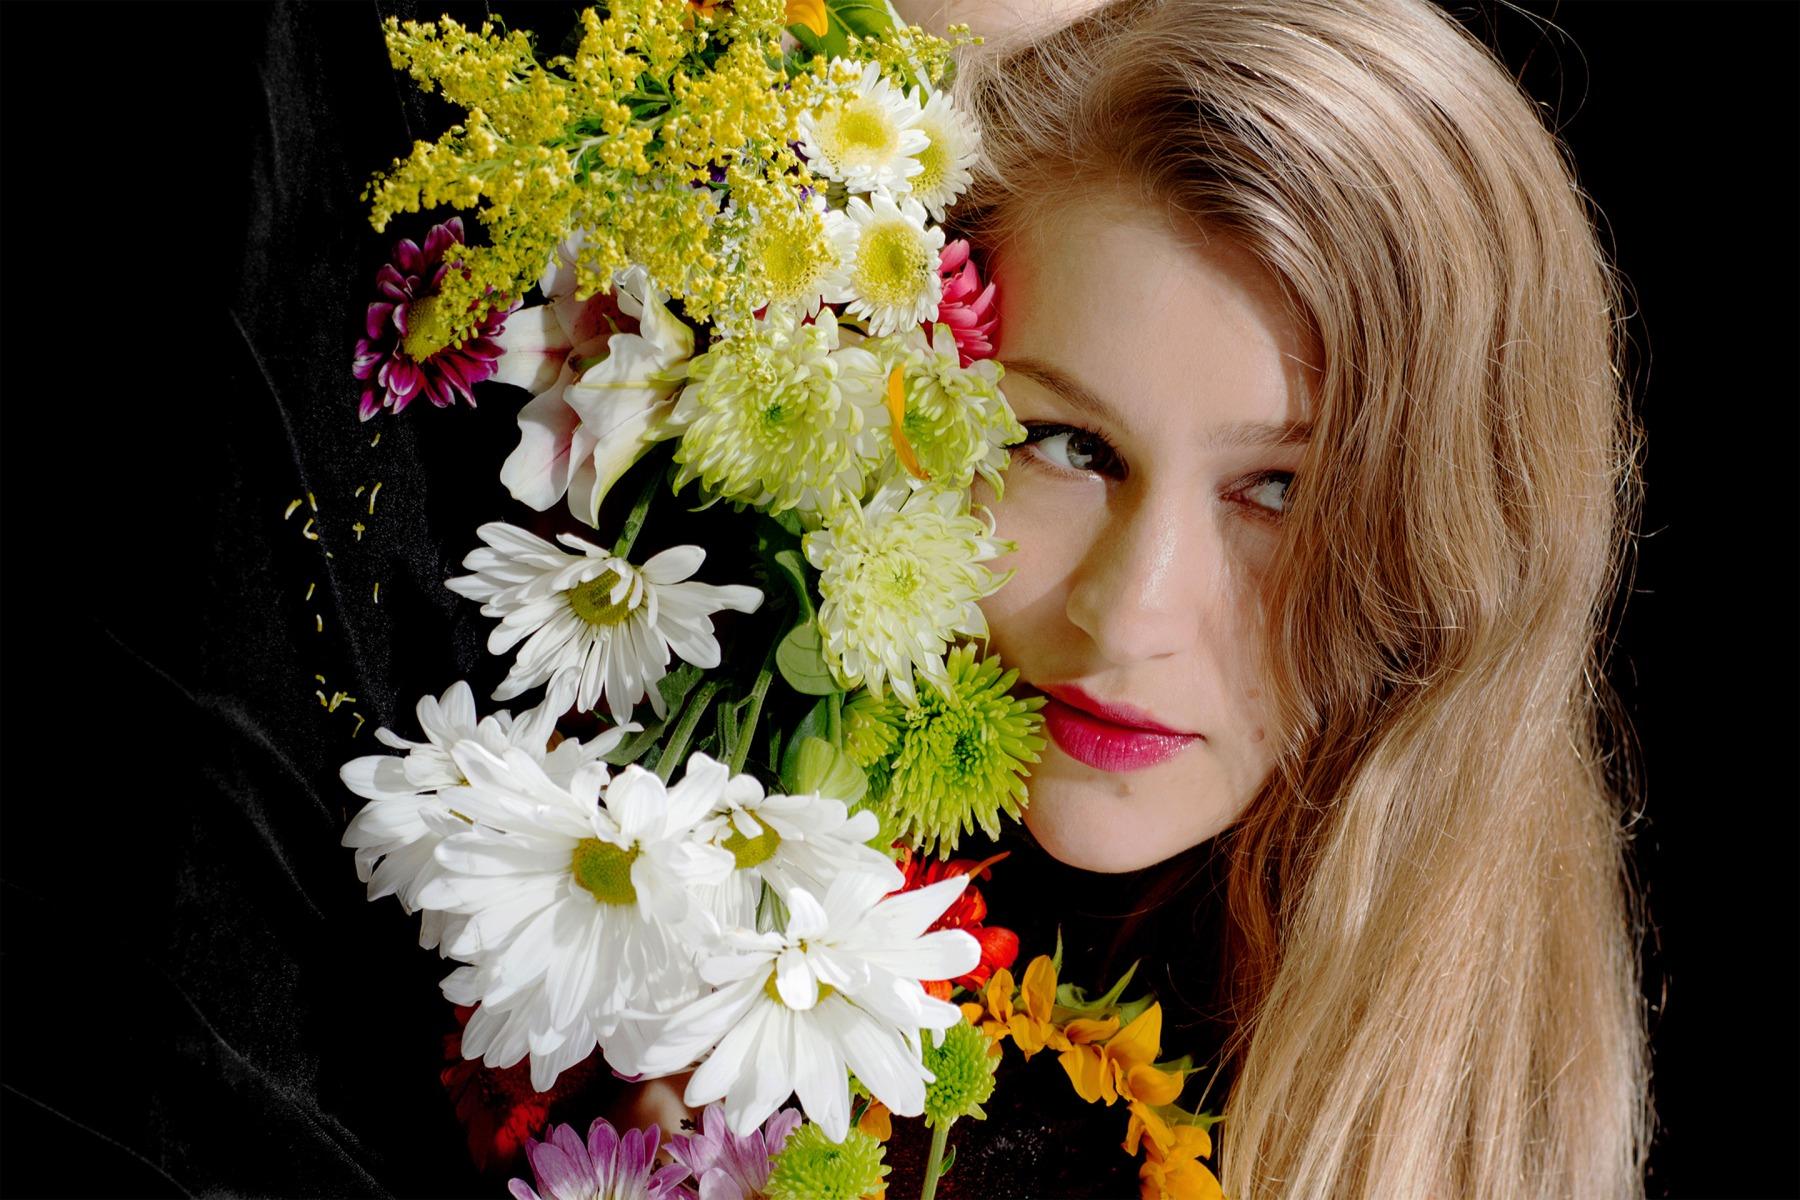 Joanna Newsom   Photo Direction  Photographer: Brian Vu  For the FADER 2015